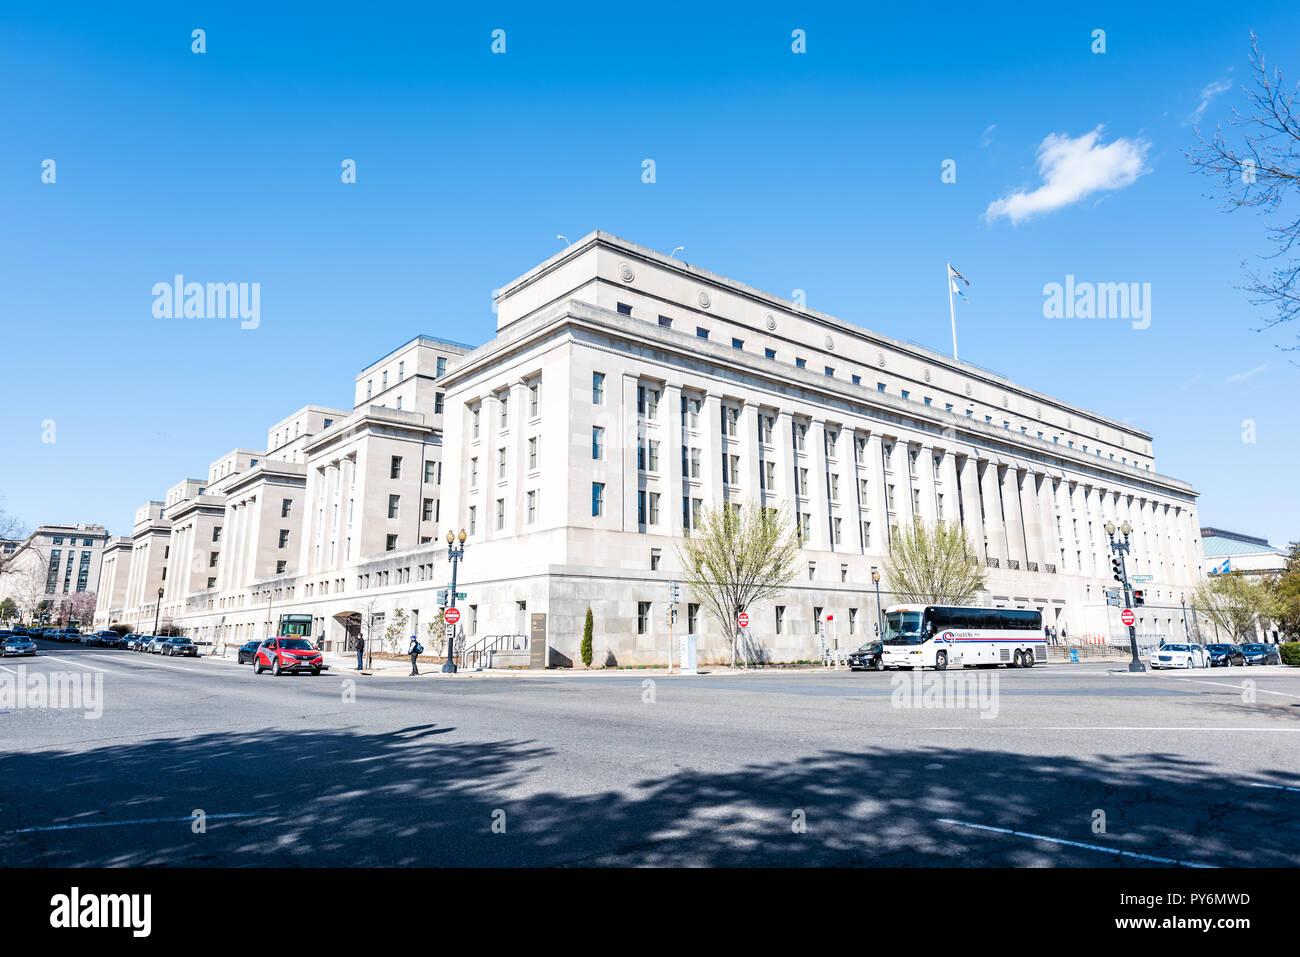 Washington Dc Usa April 5 2018 United States Department Of